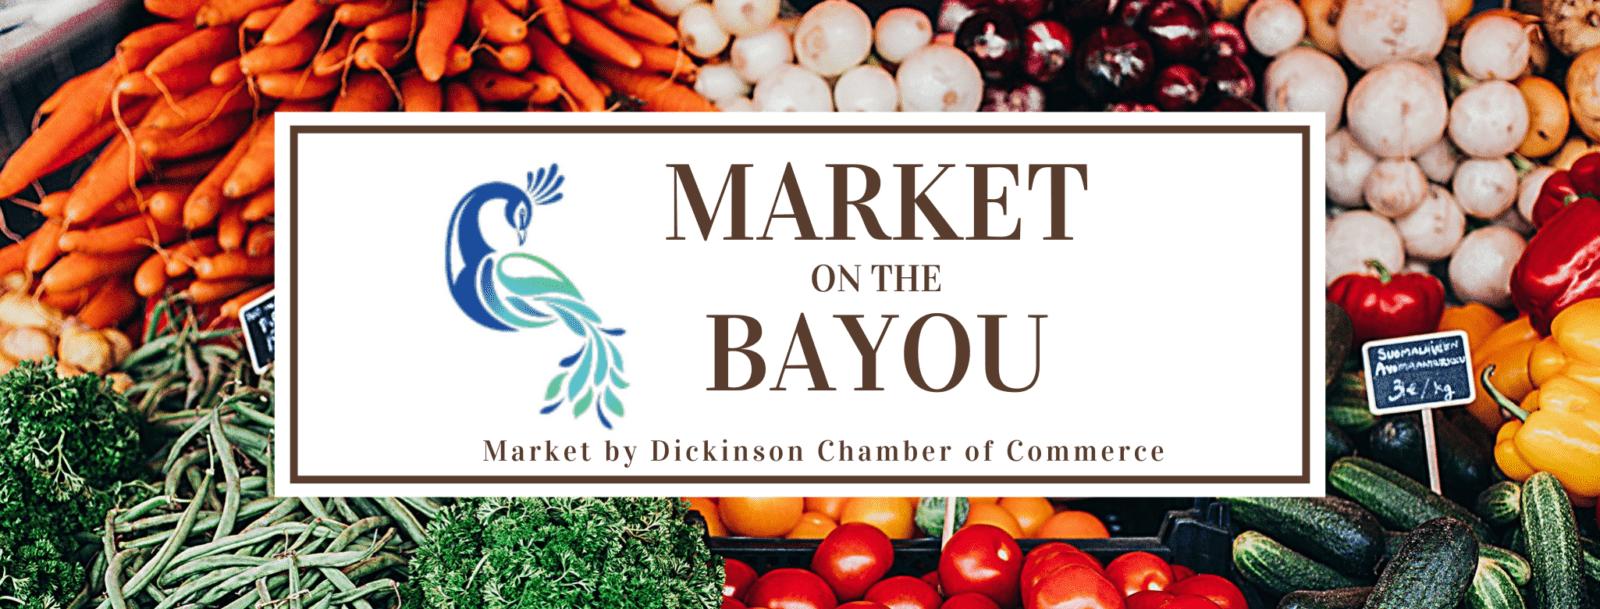 Market on the Baou